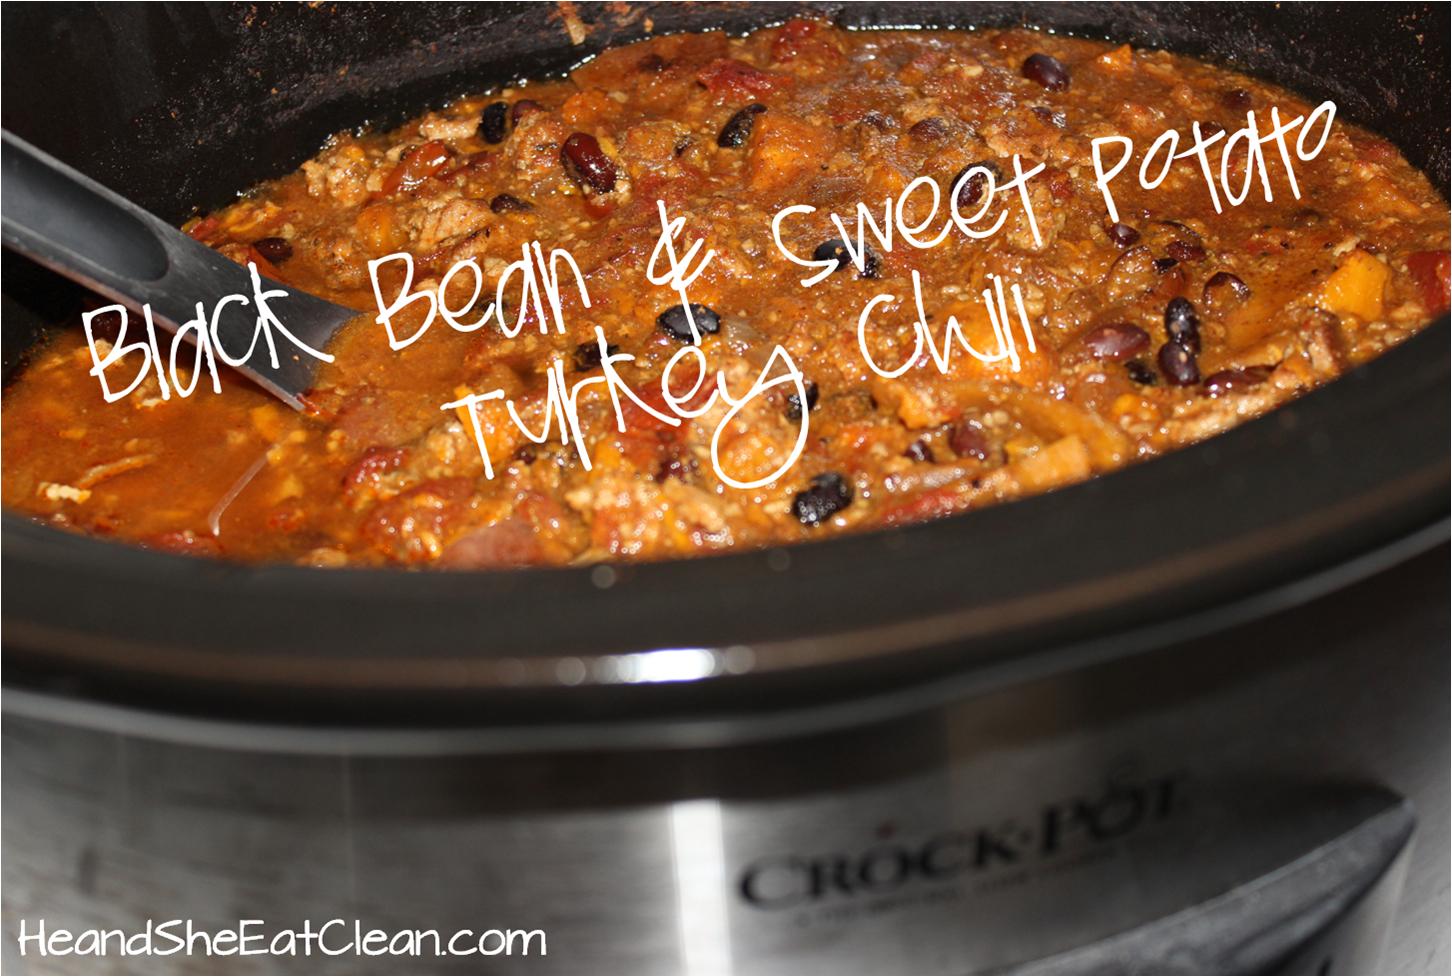 ... Dish Slow Cooker Crock Pot Black Bean And Sweet Potato Turkey Chili